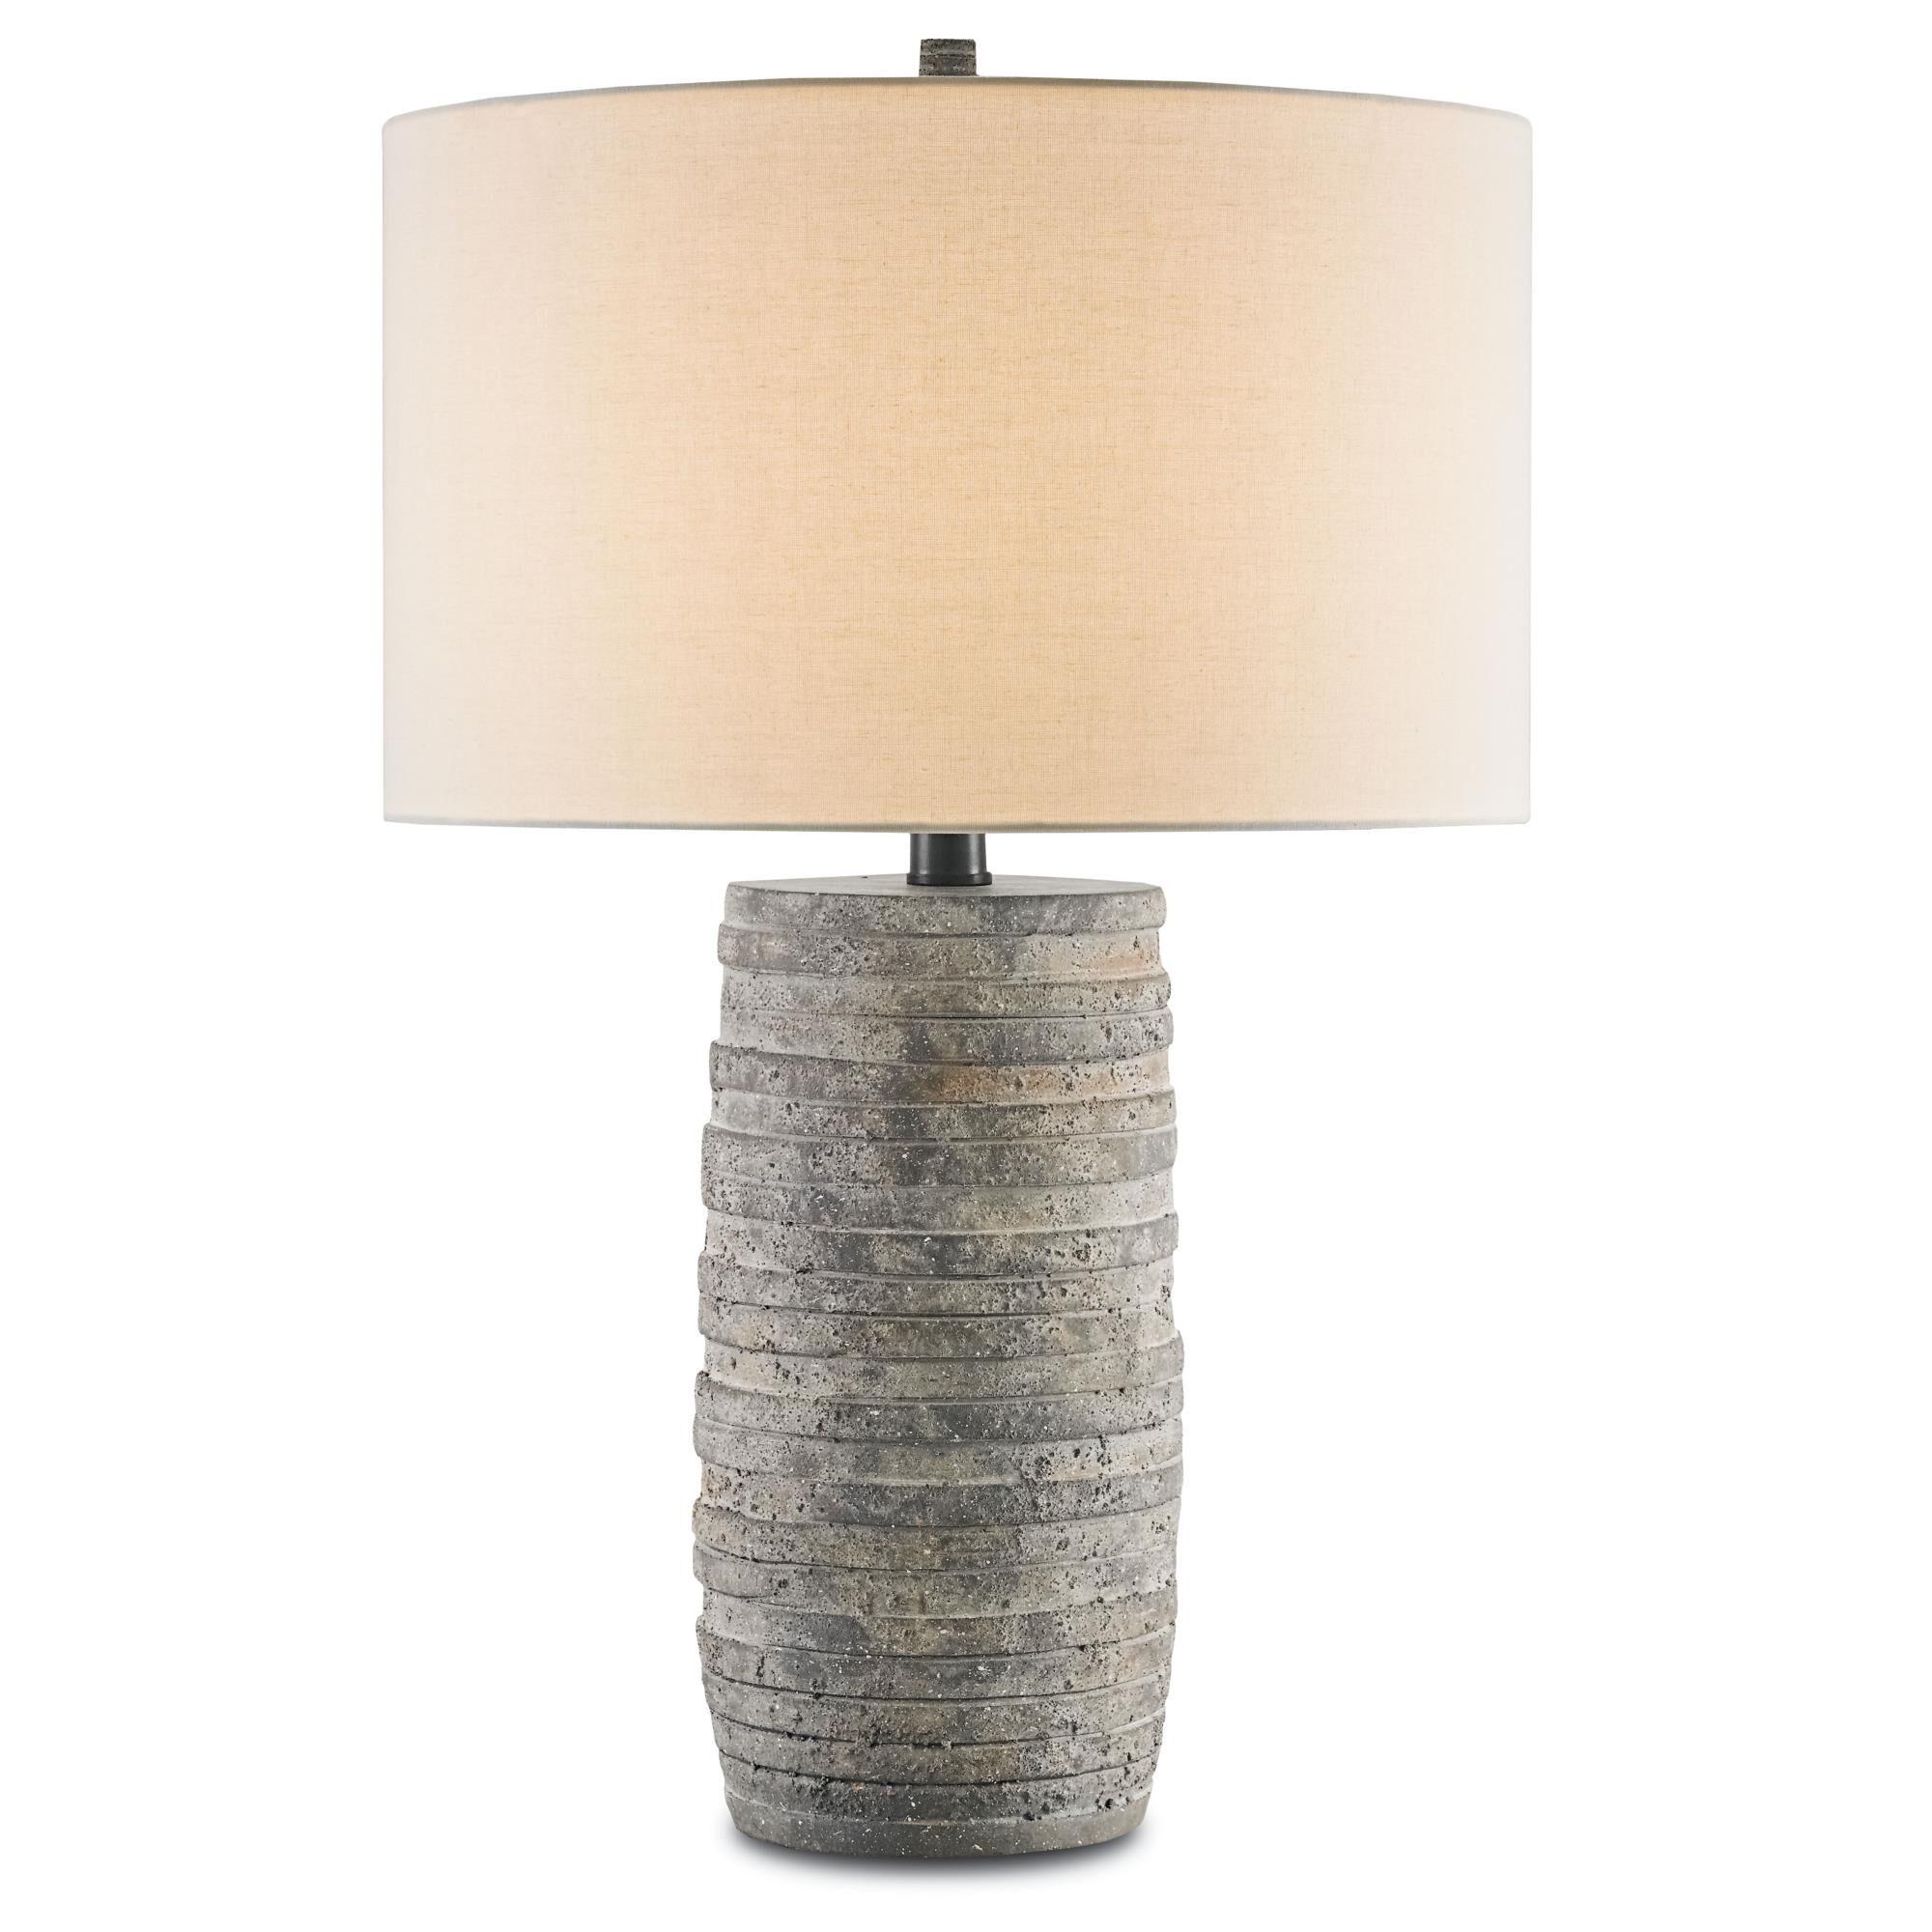 Innkeeper 30 Inch Table Lamp Capitol Lighting Table Lamp Rustic Table Lamps Table Lamp Design